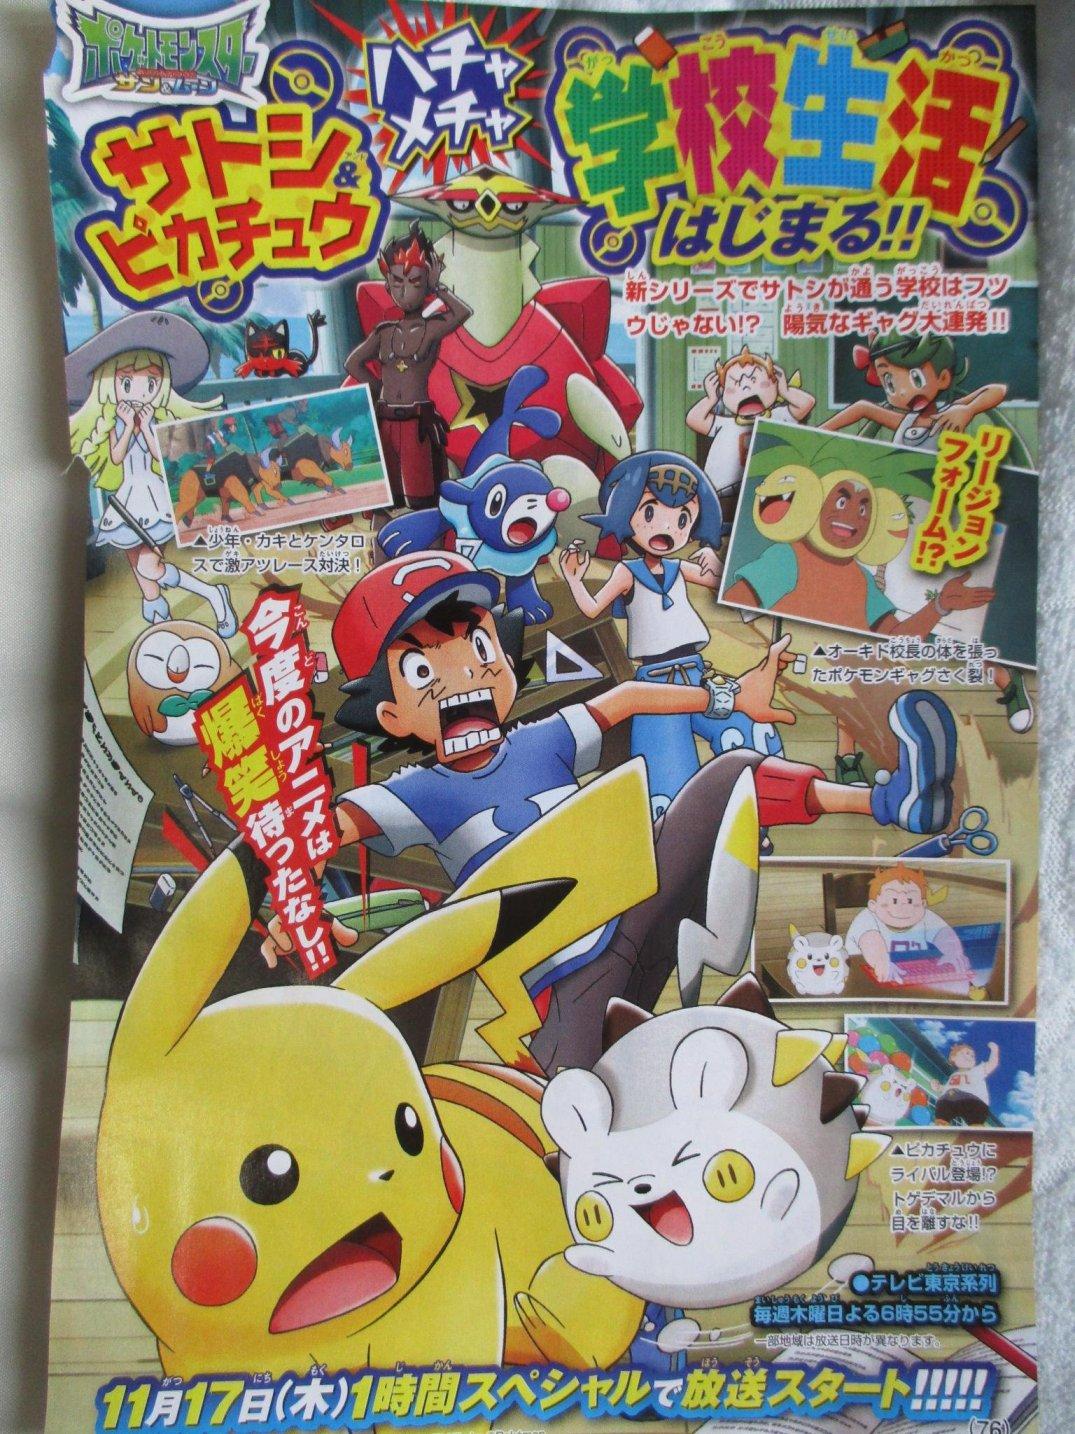 PokemonSoleil 3DS Div 019